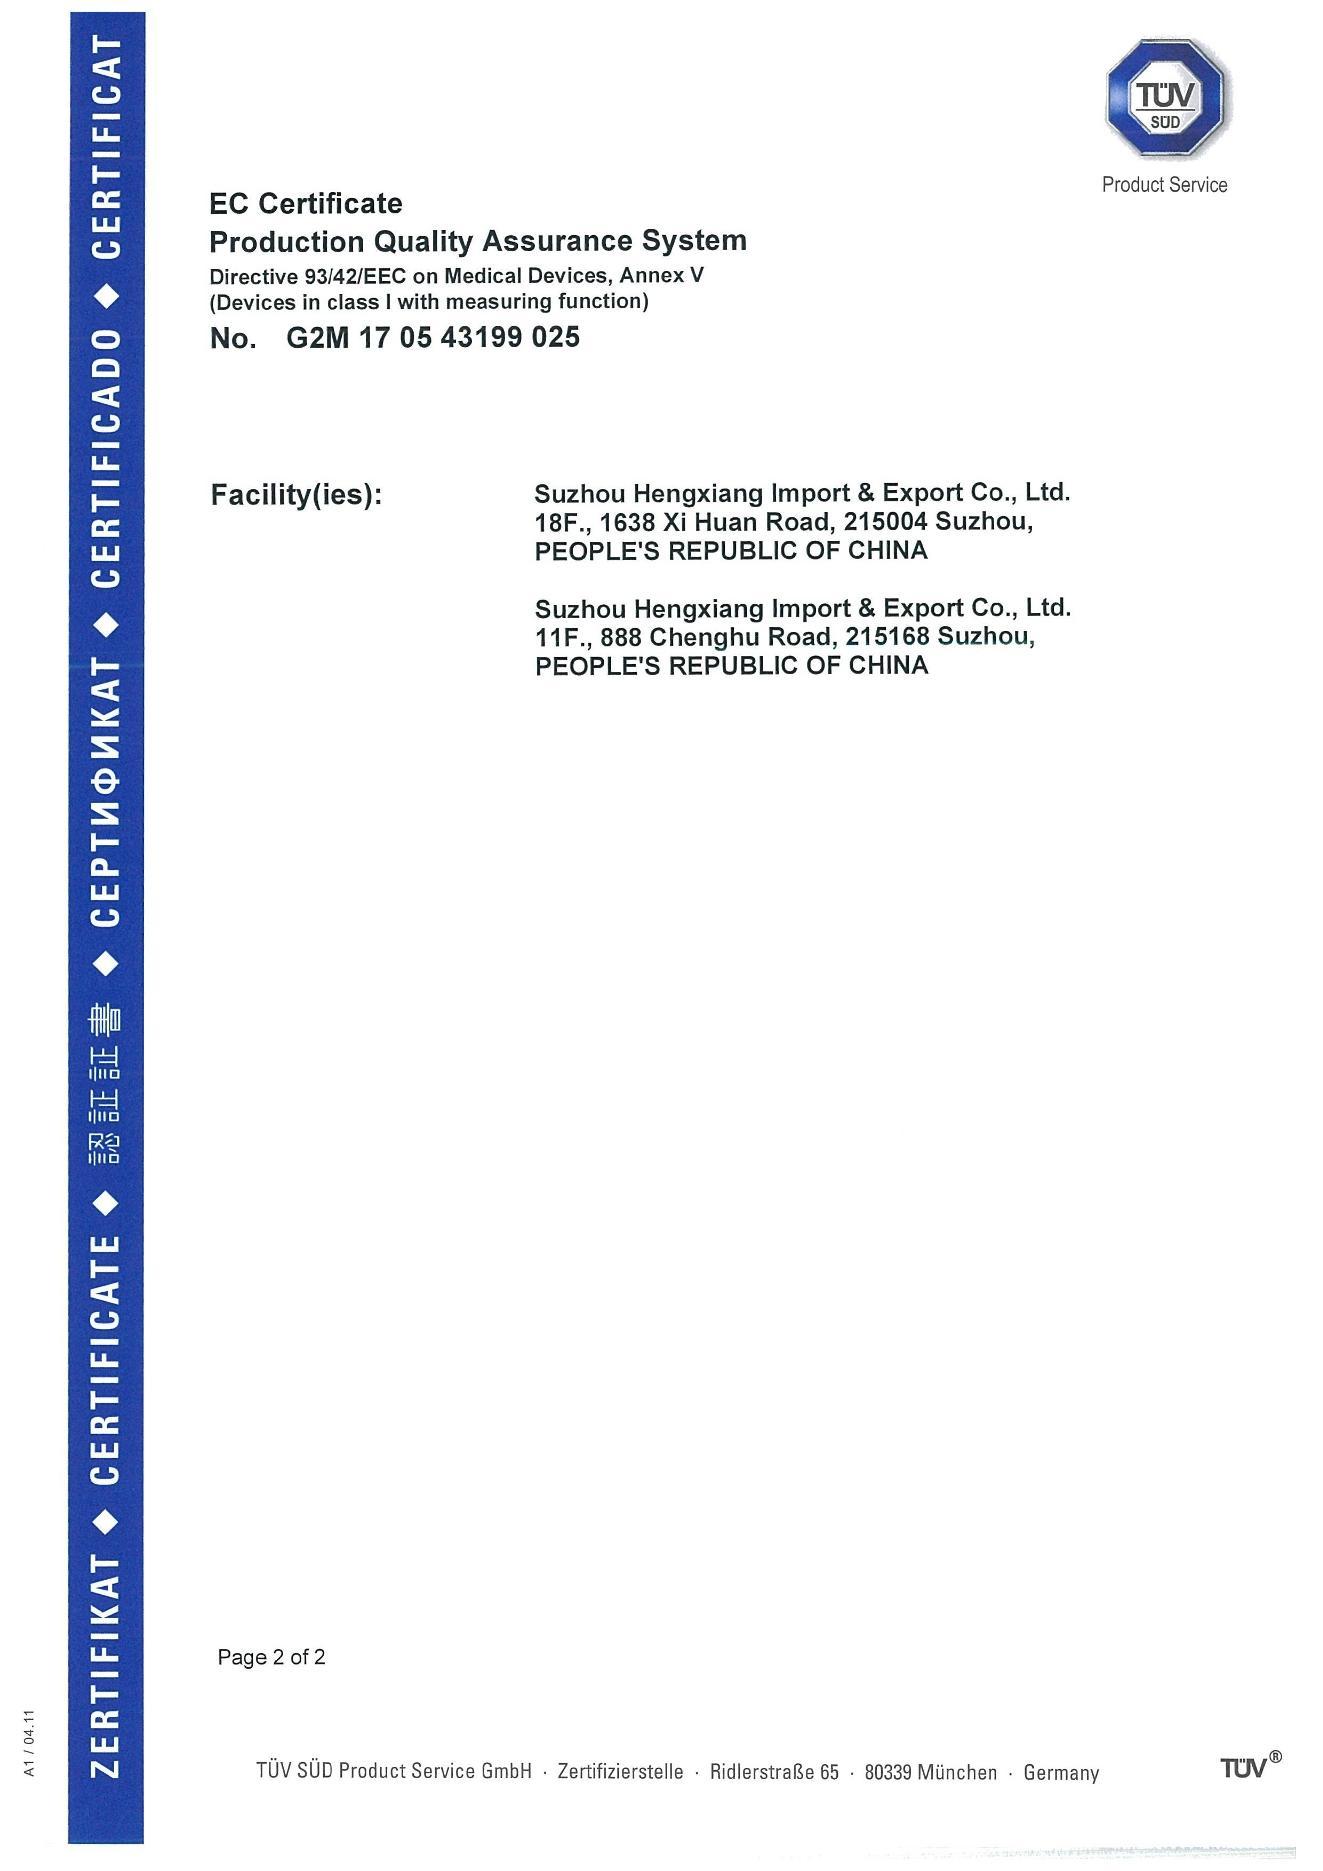 EC certificate 3-2